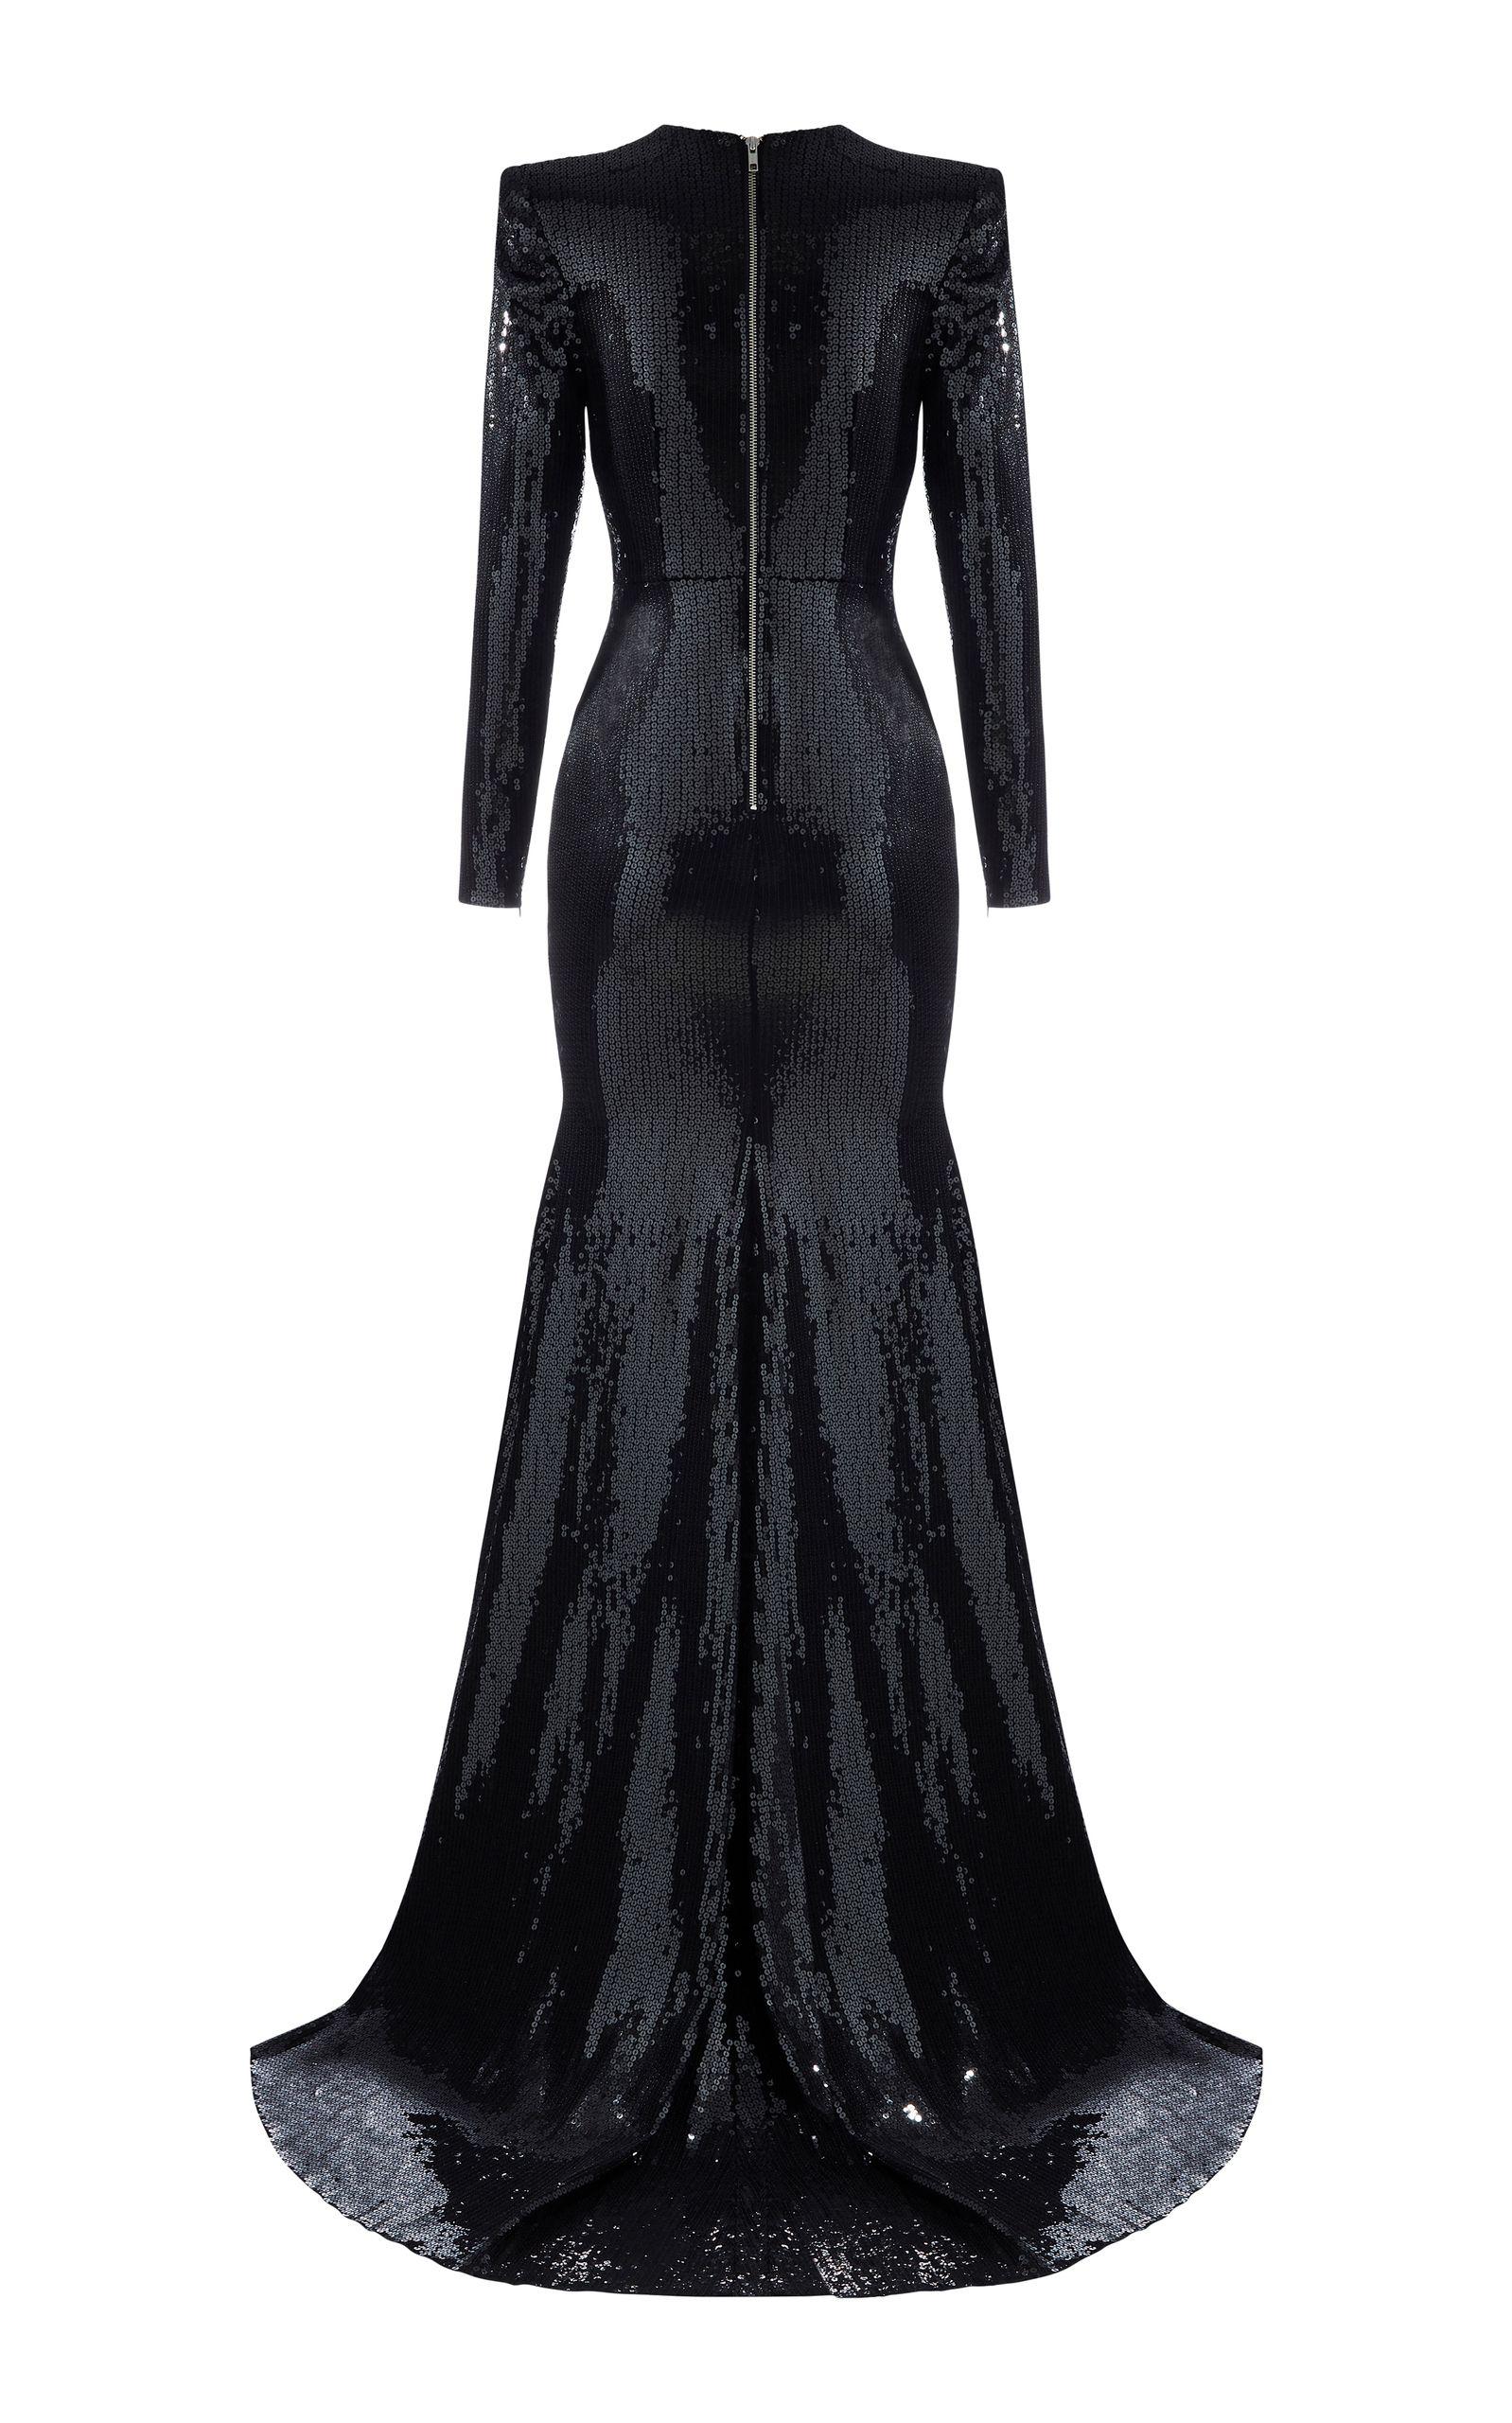 GABRIELLEu0027S AMAZING FANTASY CLOSET   Alex Perryu0027s Black Glamor Fully  Sequined Fit U0026 Flare Gown (